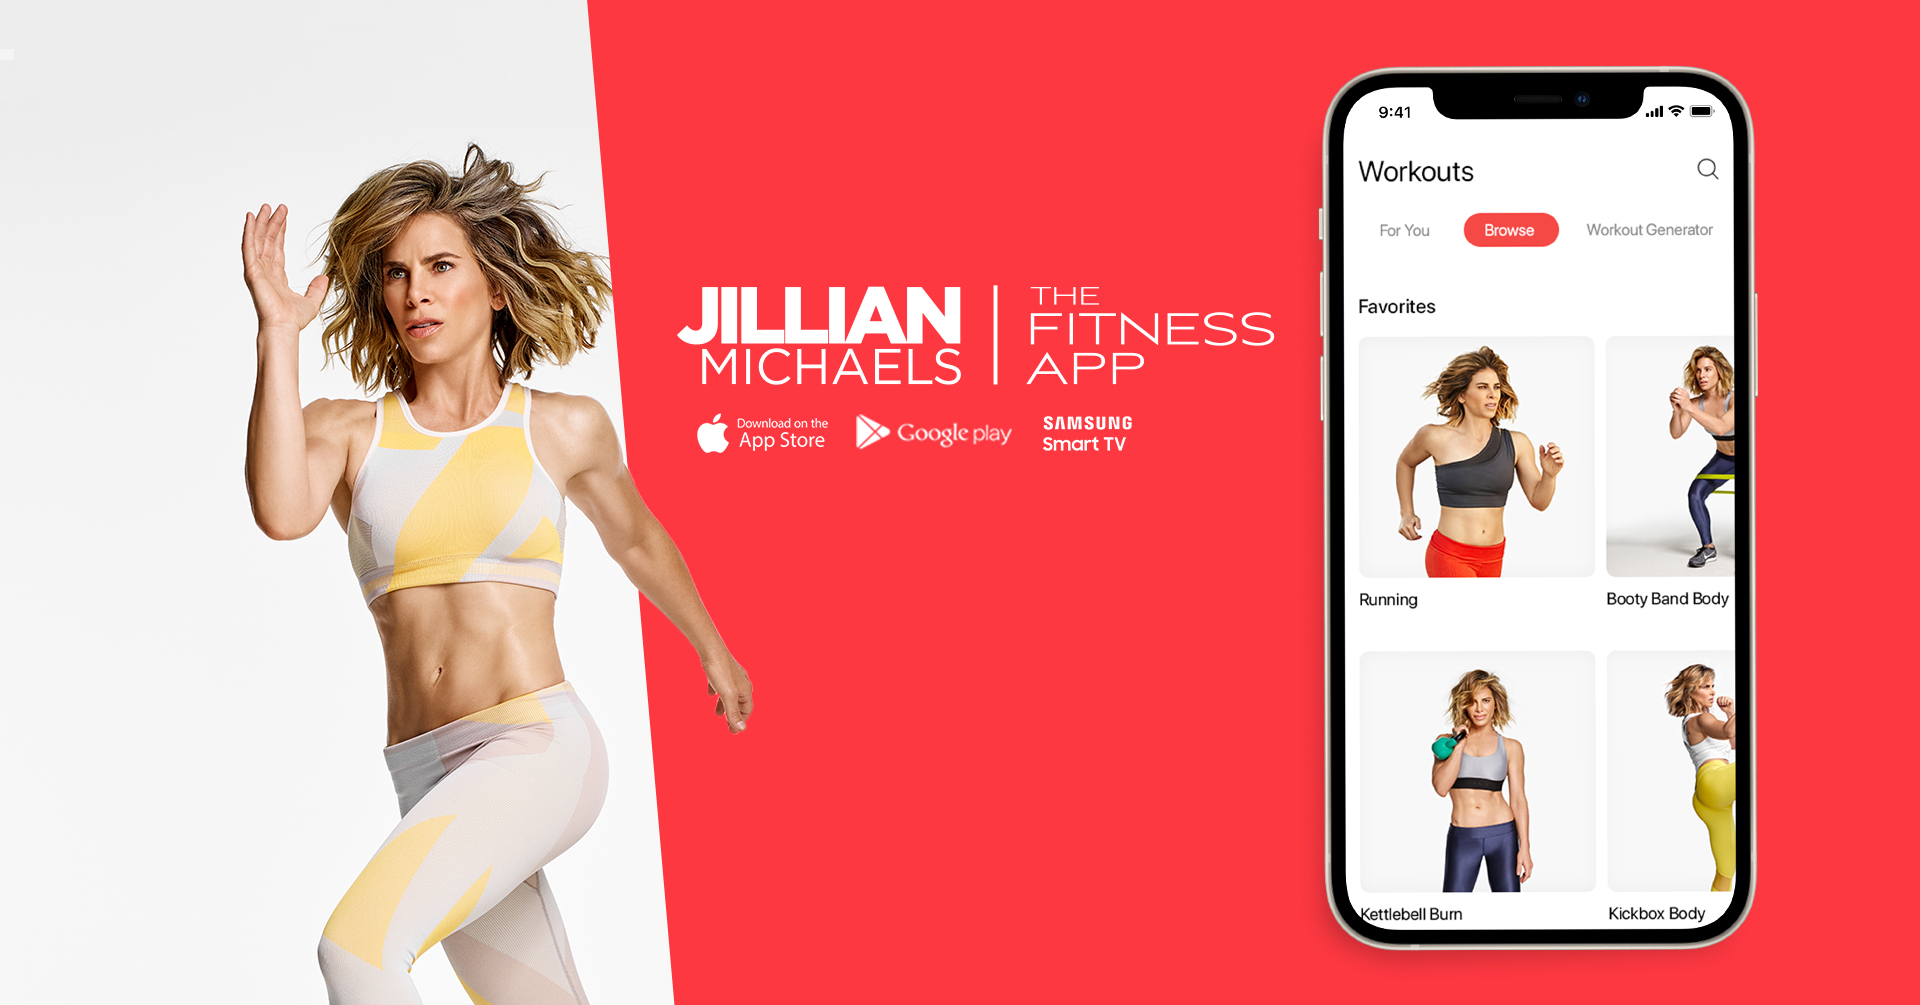 About Jillian Michaels Homepage